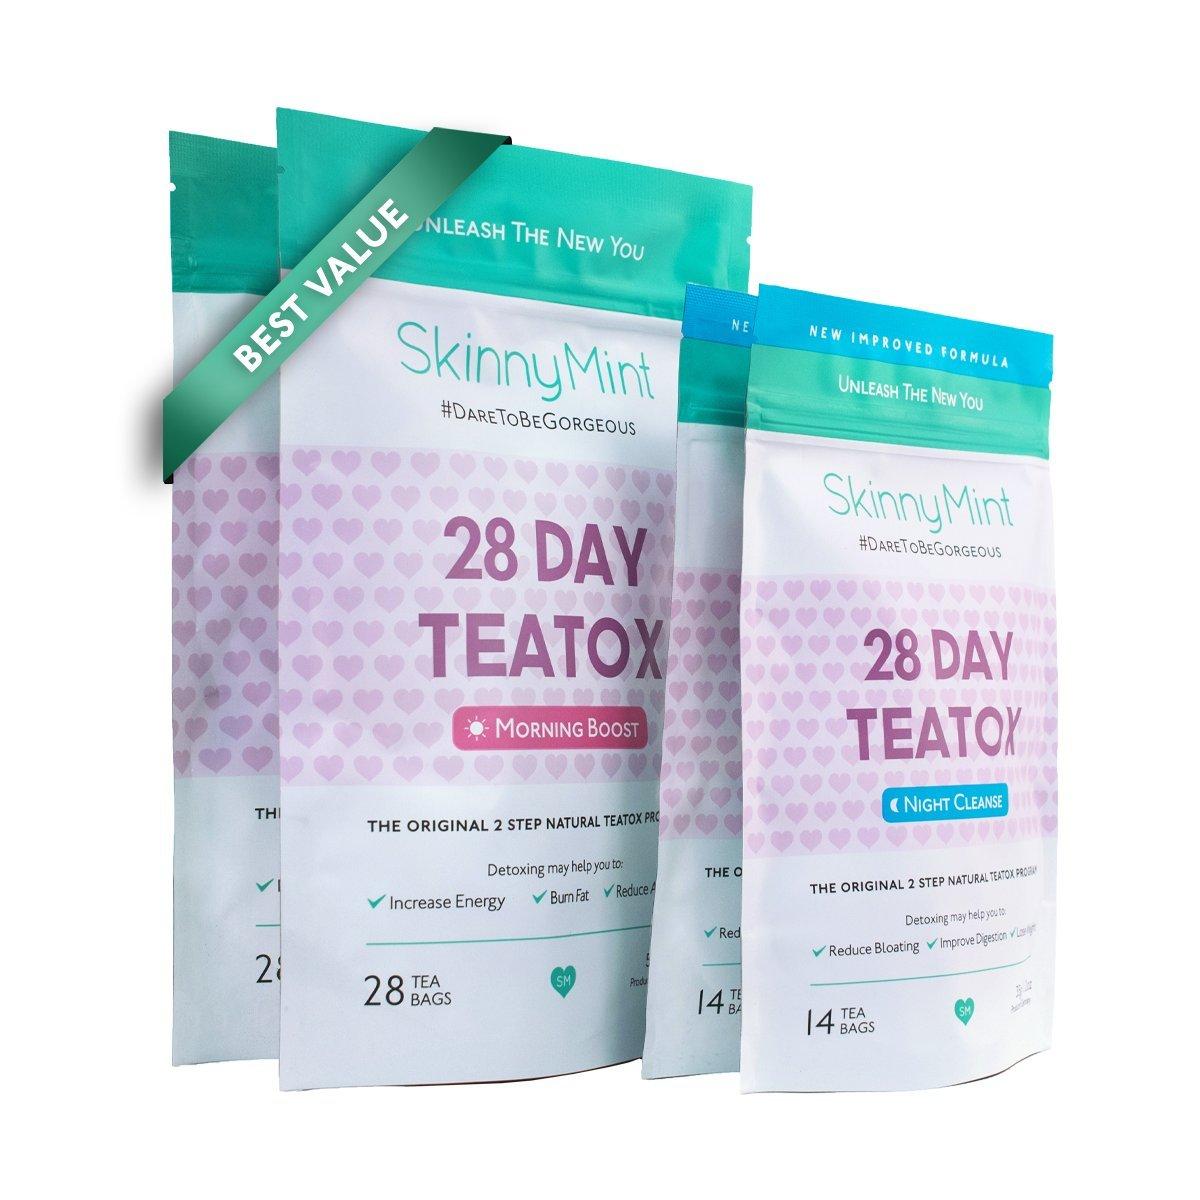 SkinnyMint - Besties Value Teatox Multi-Pack (2x28 Day) Detox Tea